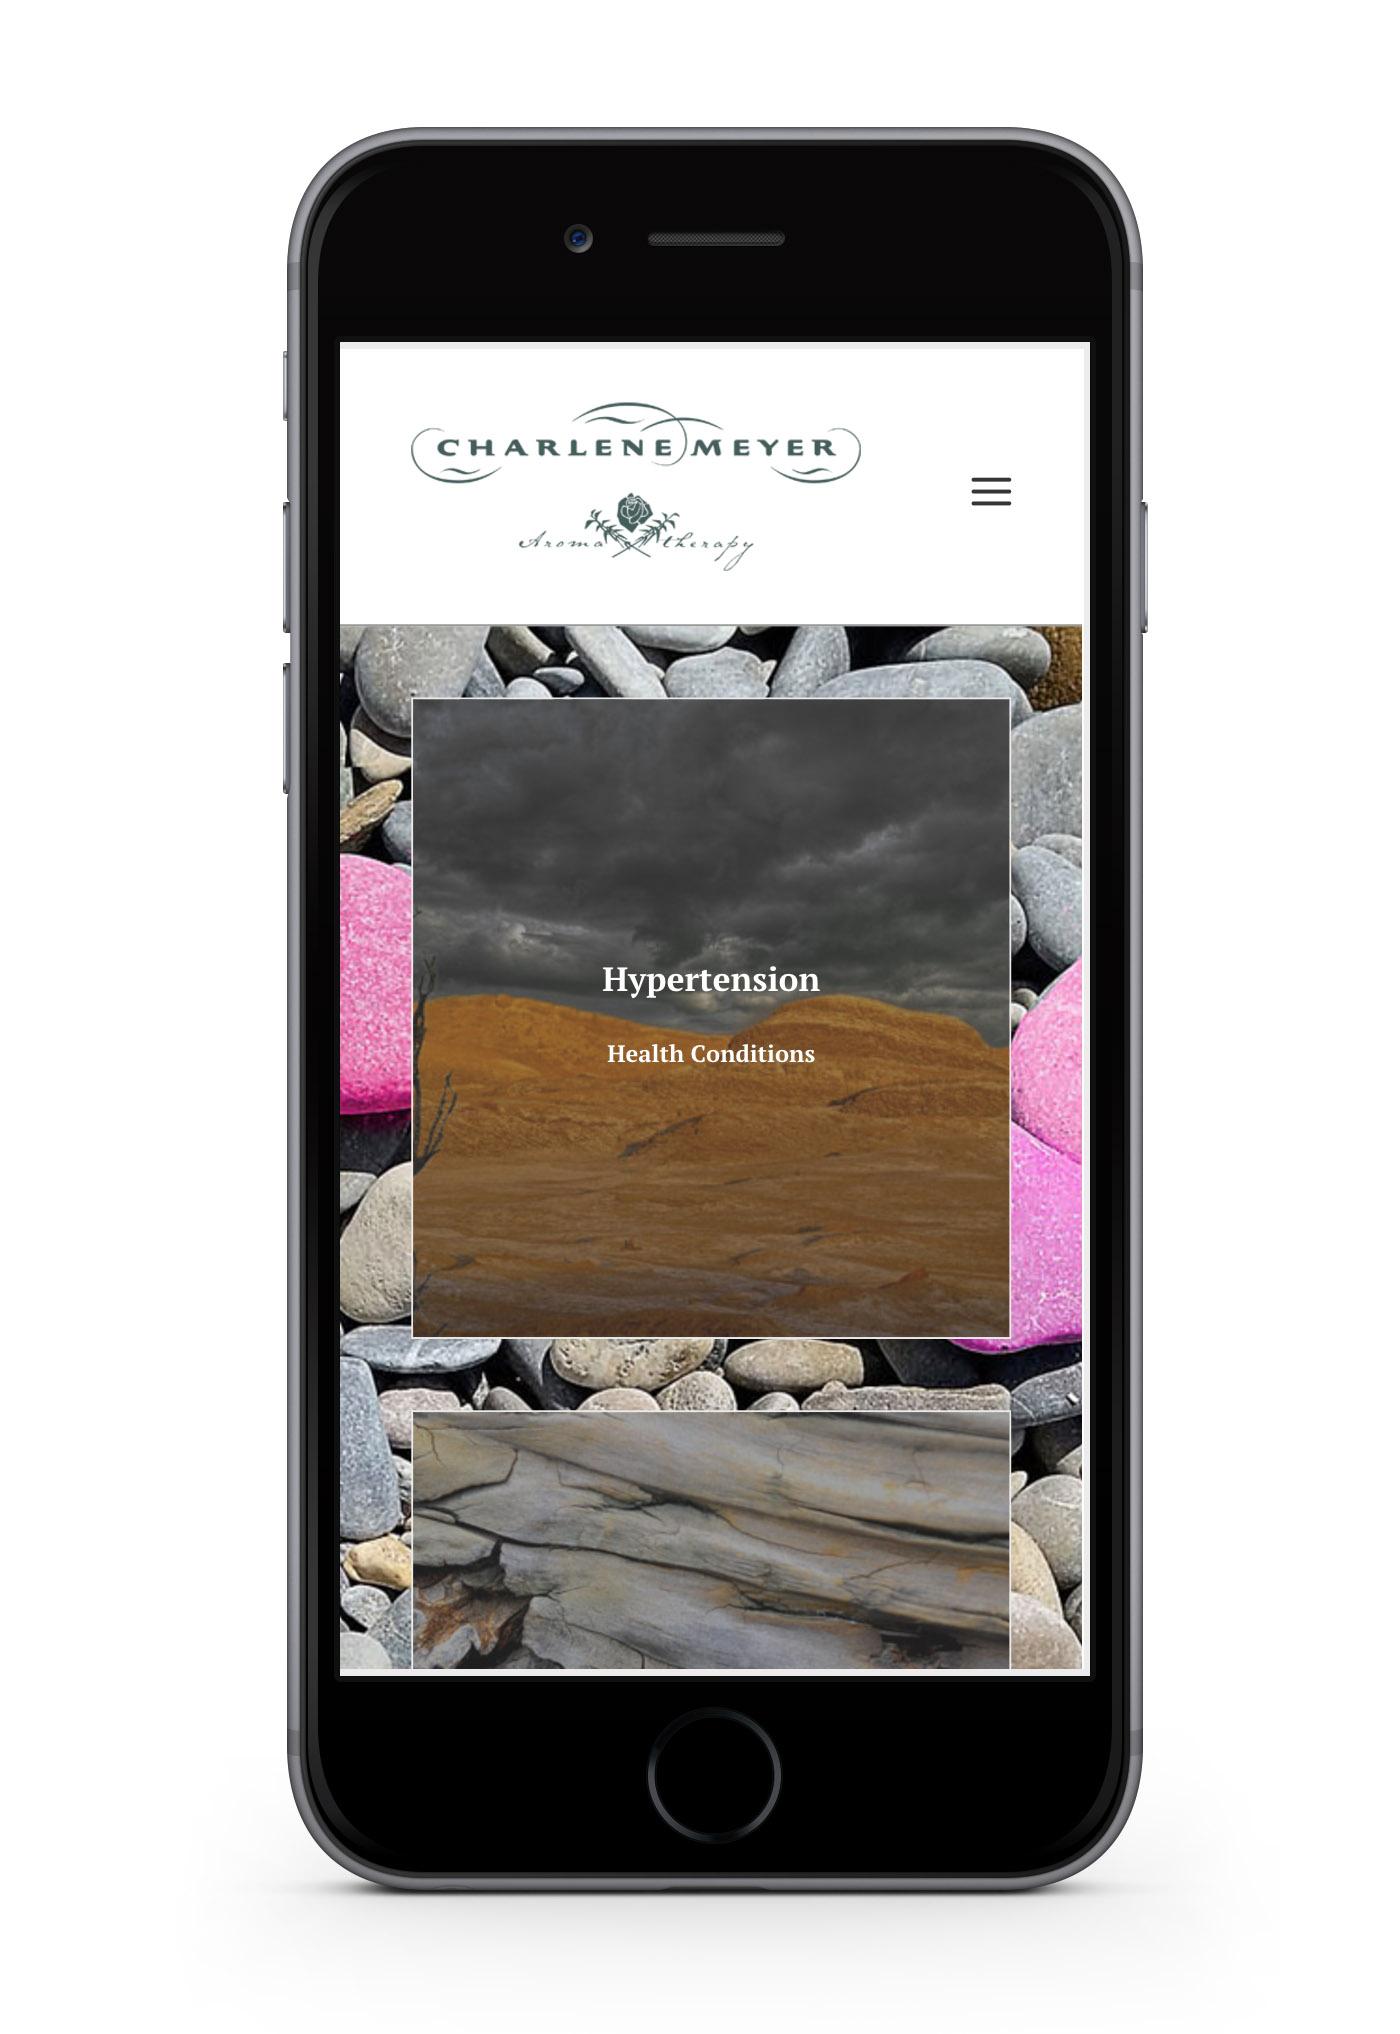 charlene meyer web design portfolio-webdoor-responsive-web-design-agency-hillcrest-kwazulu-natal-phone